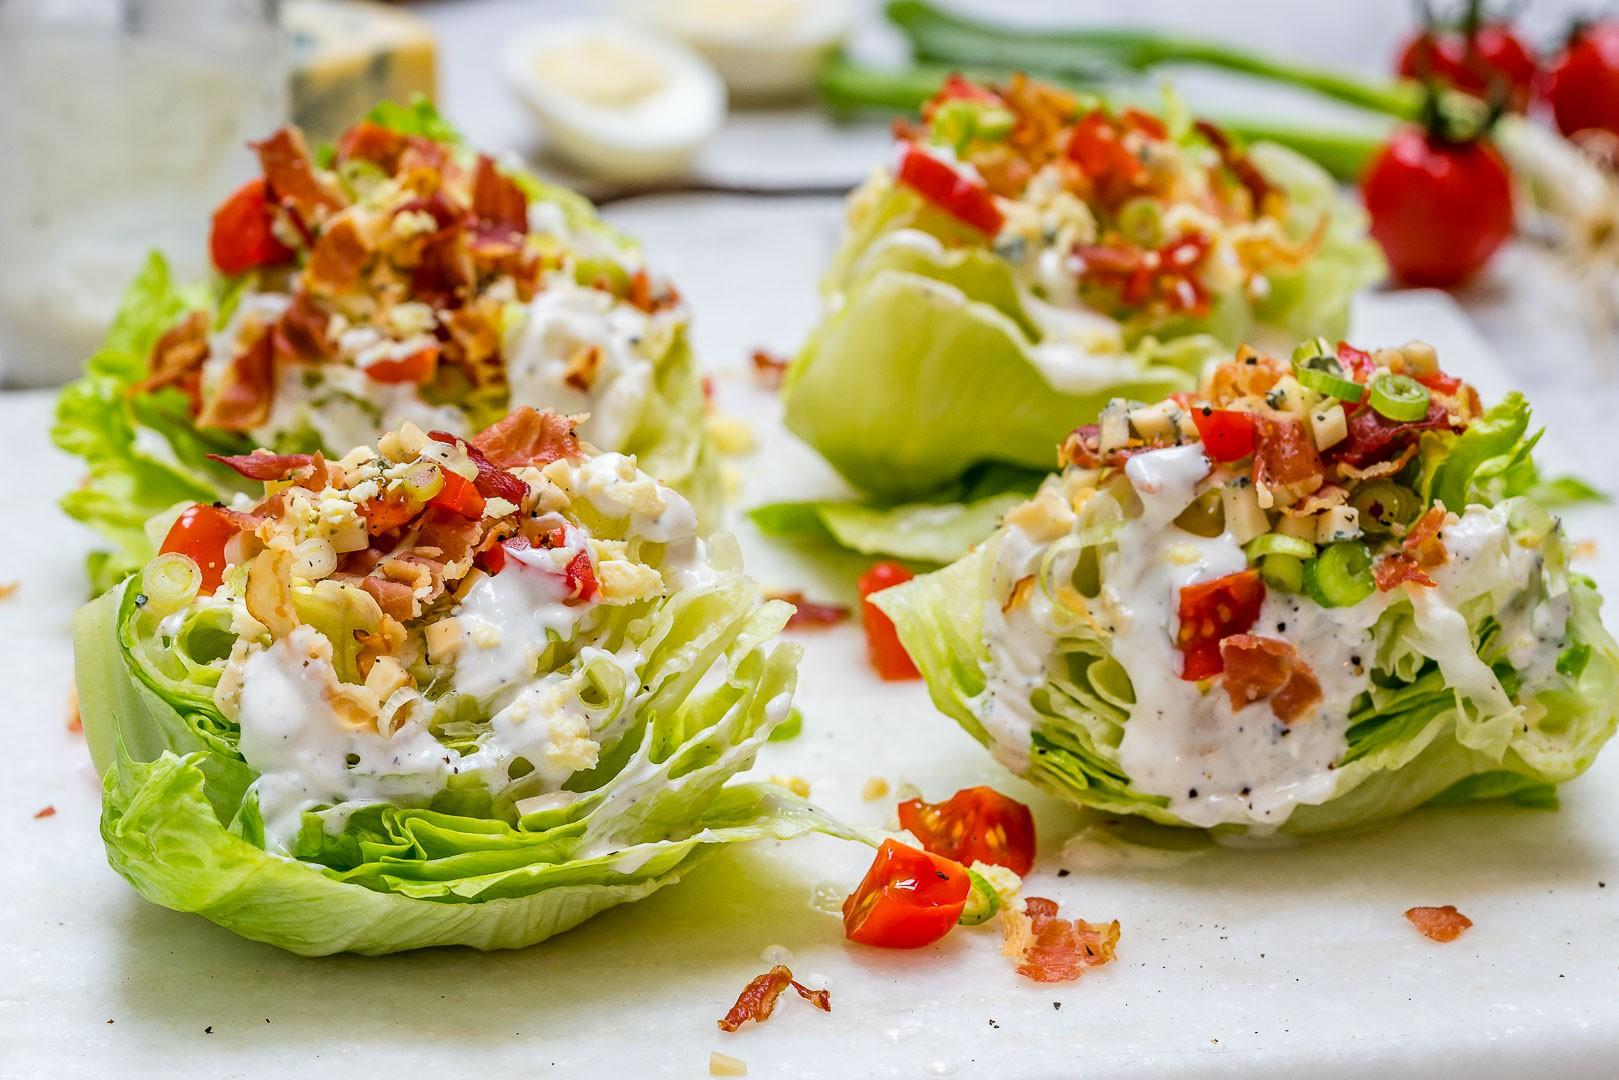 eat-clean-huong-choe-1-1531139117932944183910.jpg